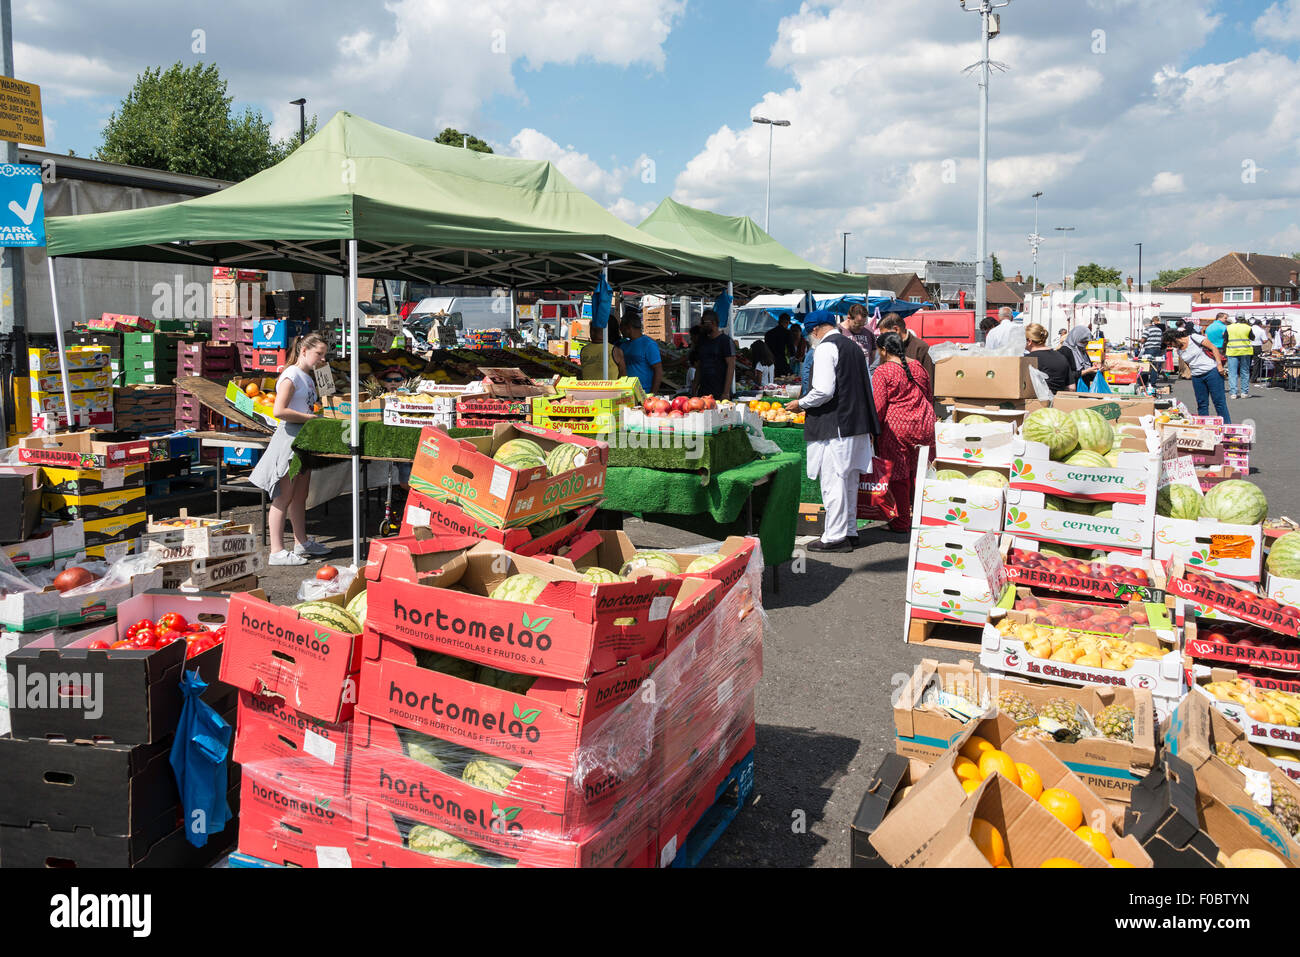 Hounslow West Park alquiler de coches Mercado de arranque, Hounslow West, London Borough de Hounslow, Greater London, Imagen De Stock